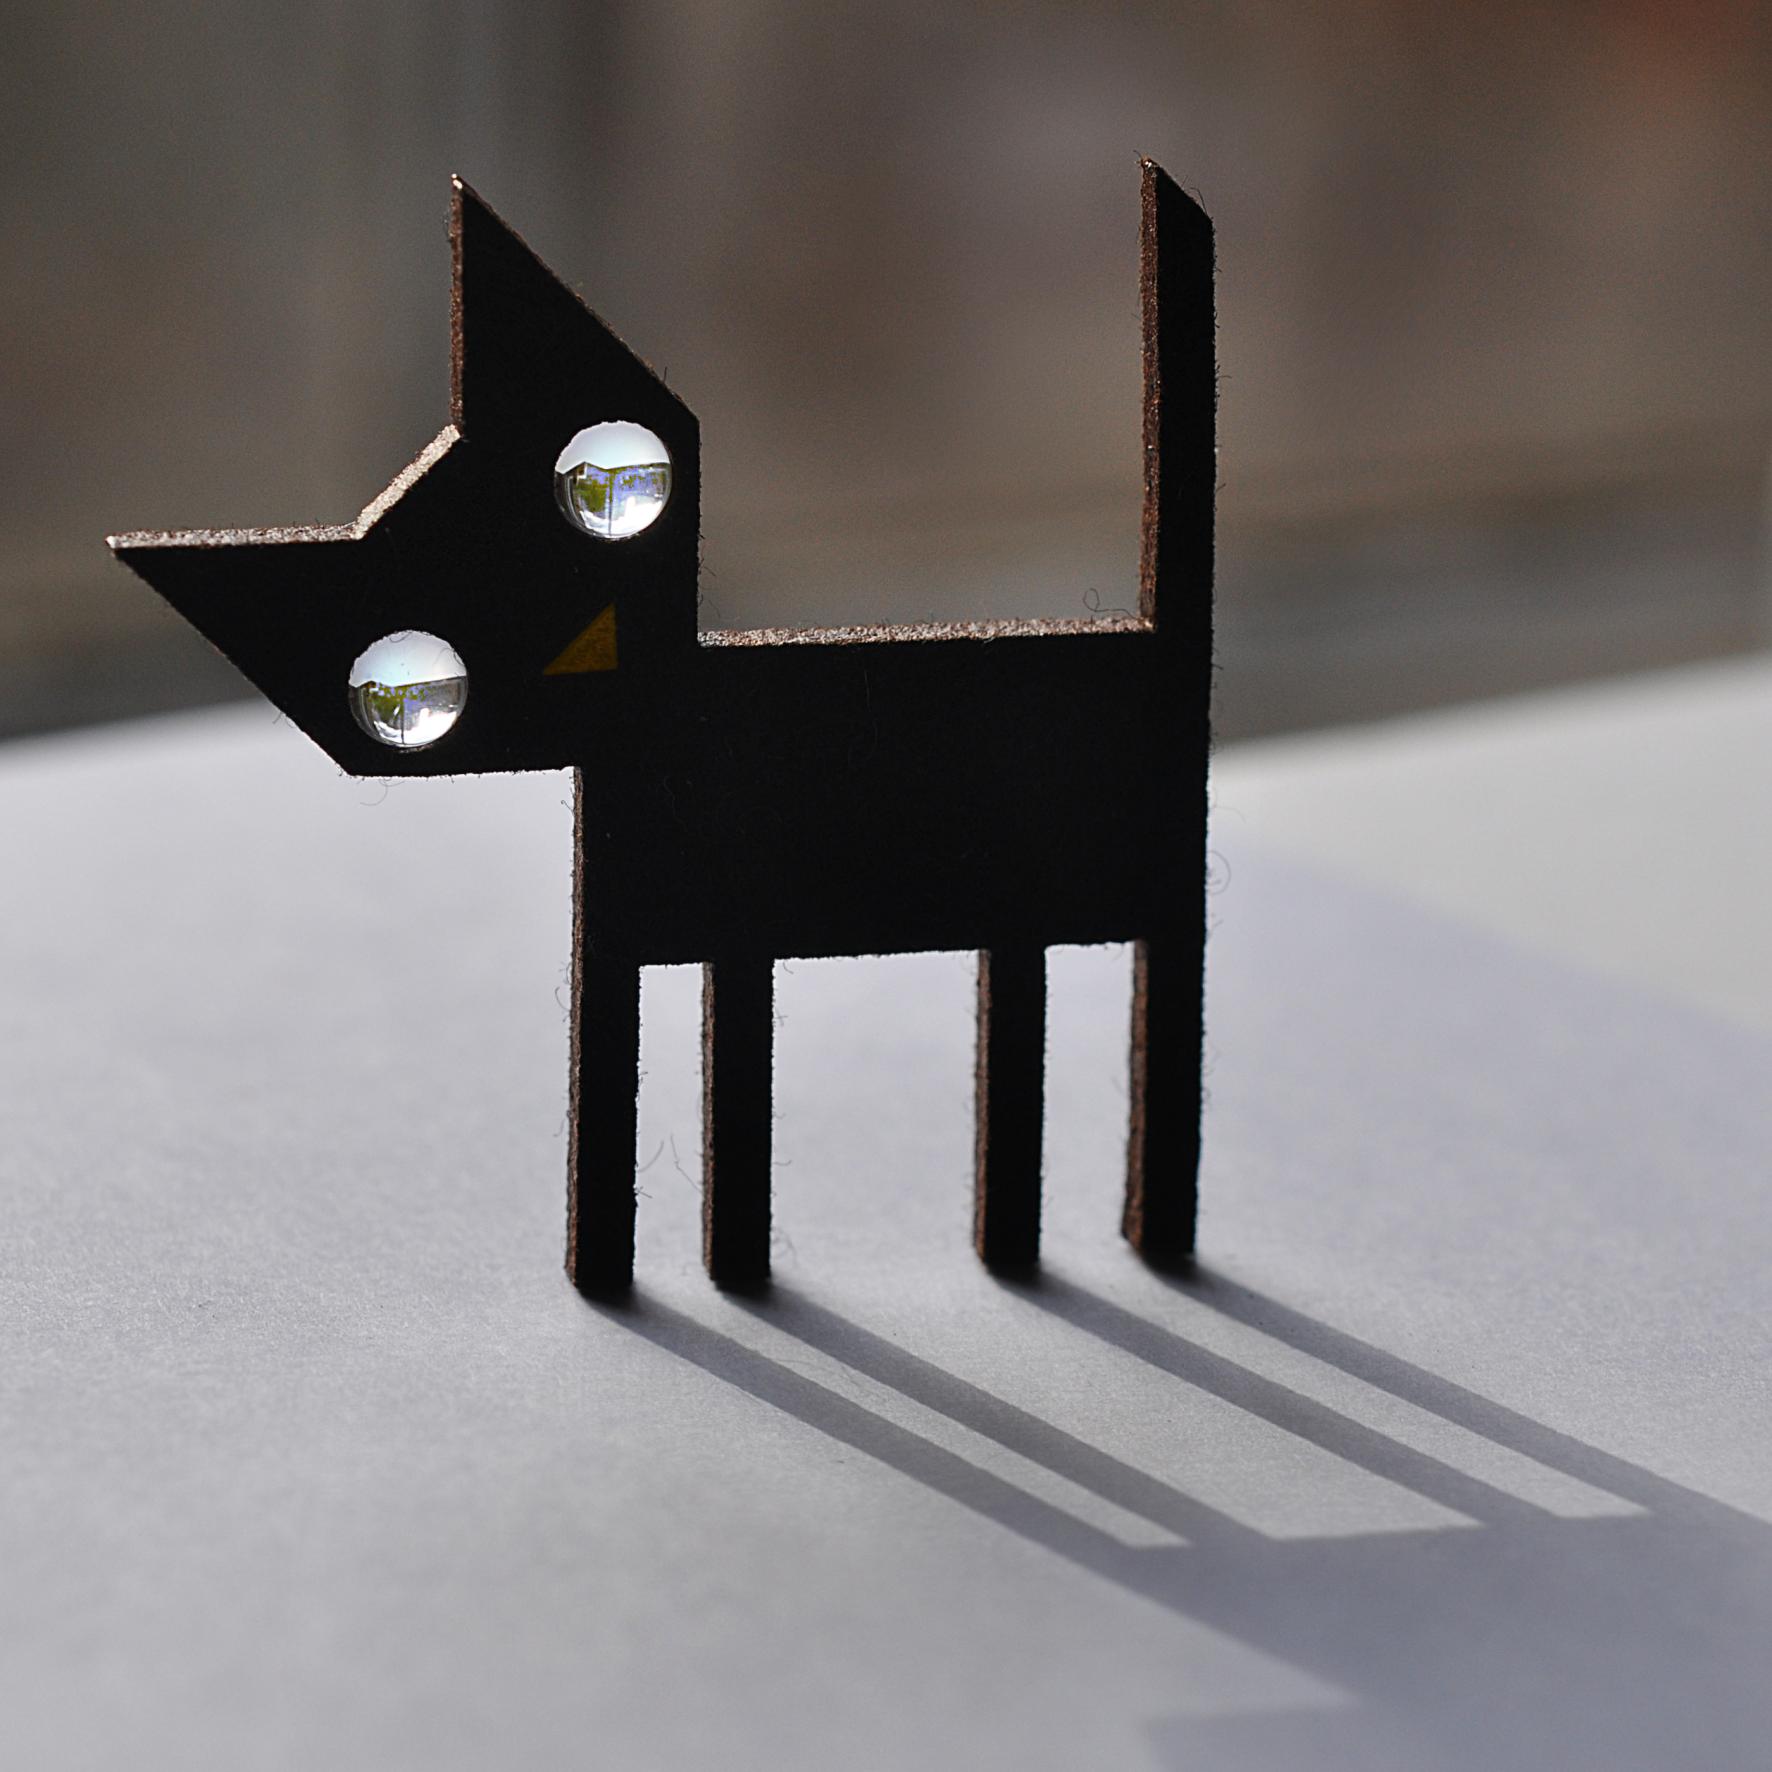 Cat's Eyes. Dougie Scott